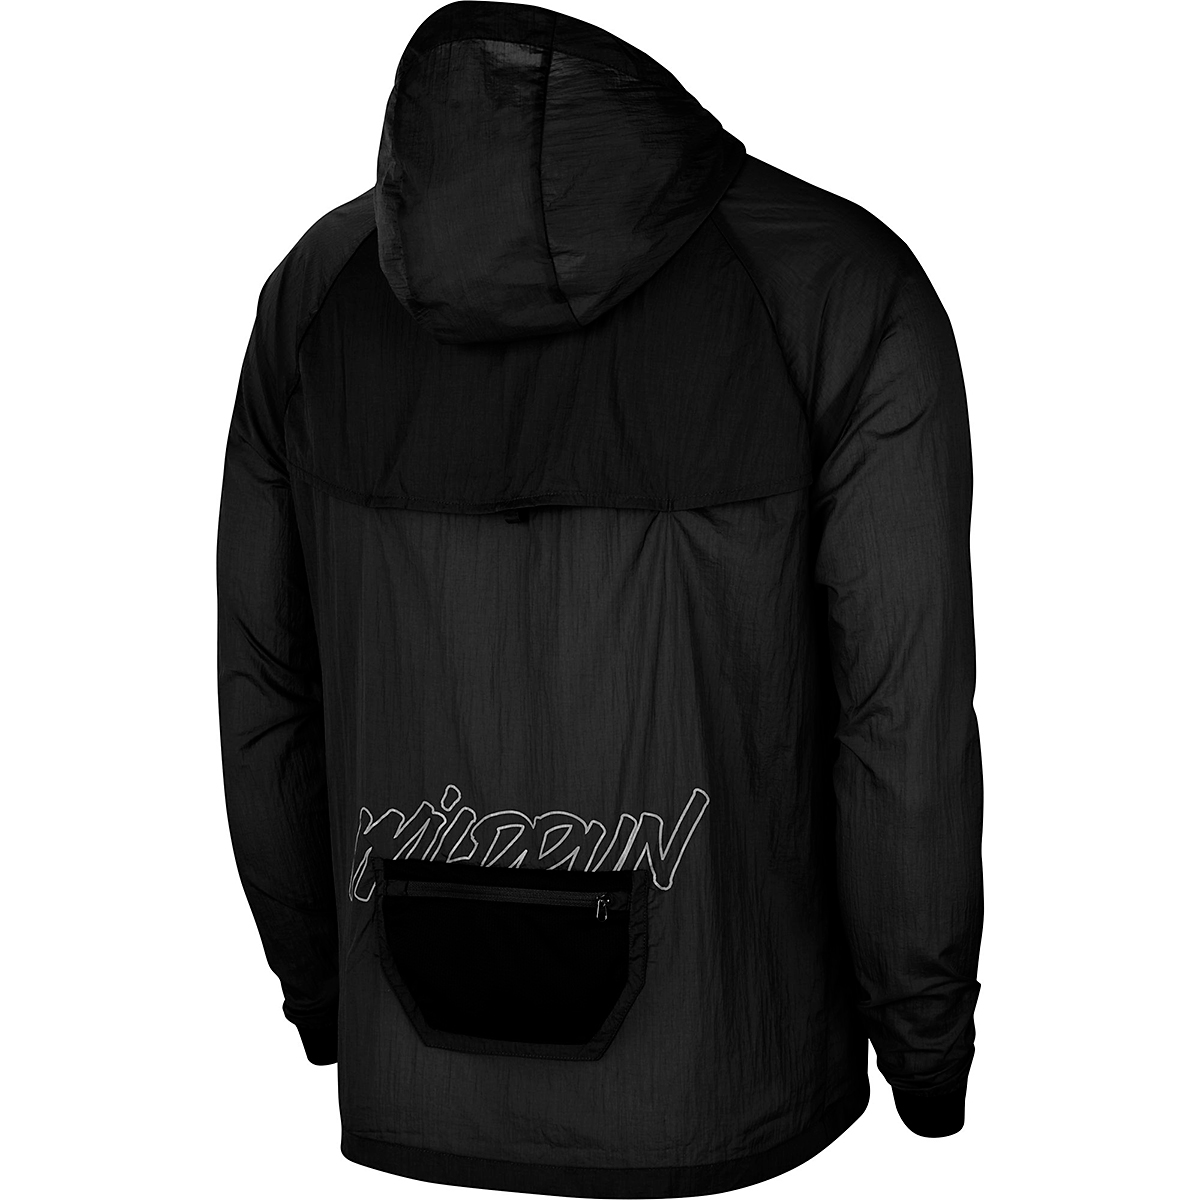 Men's Nike Windrunner Wild Run Running Jacket - Color: Black/Dark Smoke Grey/Claystone Red - Size: S, Black/Dark Smoke Grey/Claystone Red, large, image 4